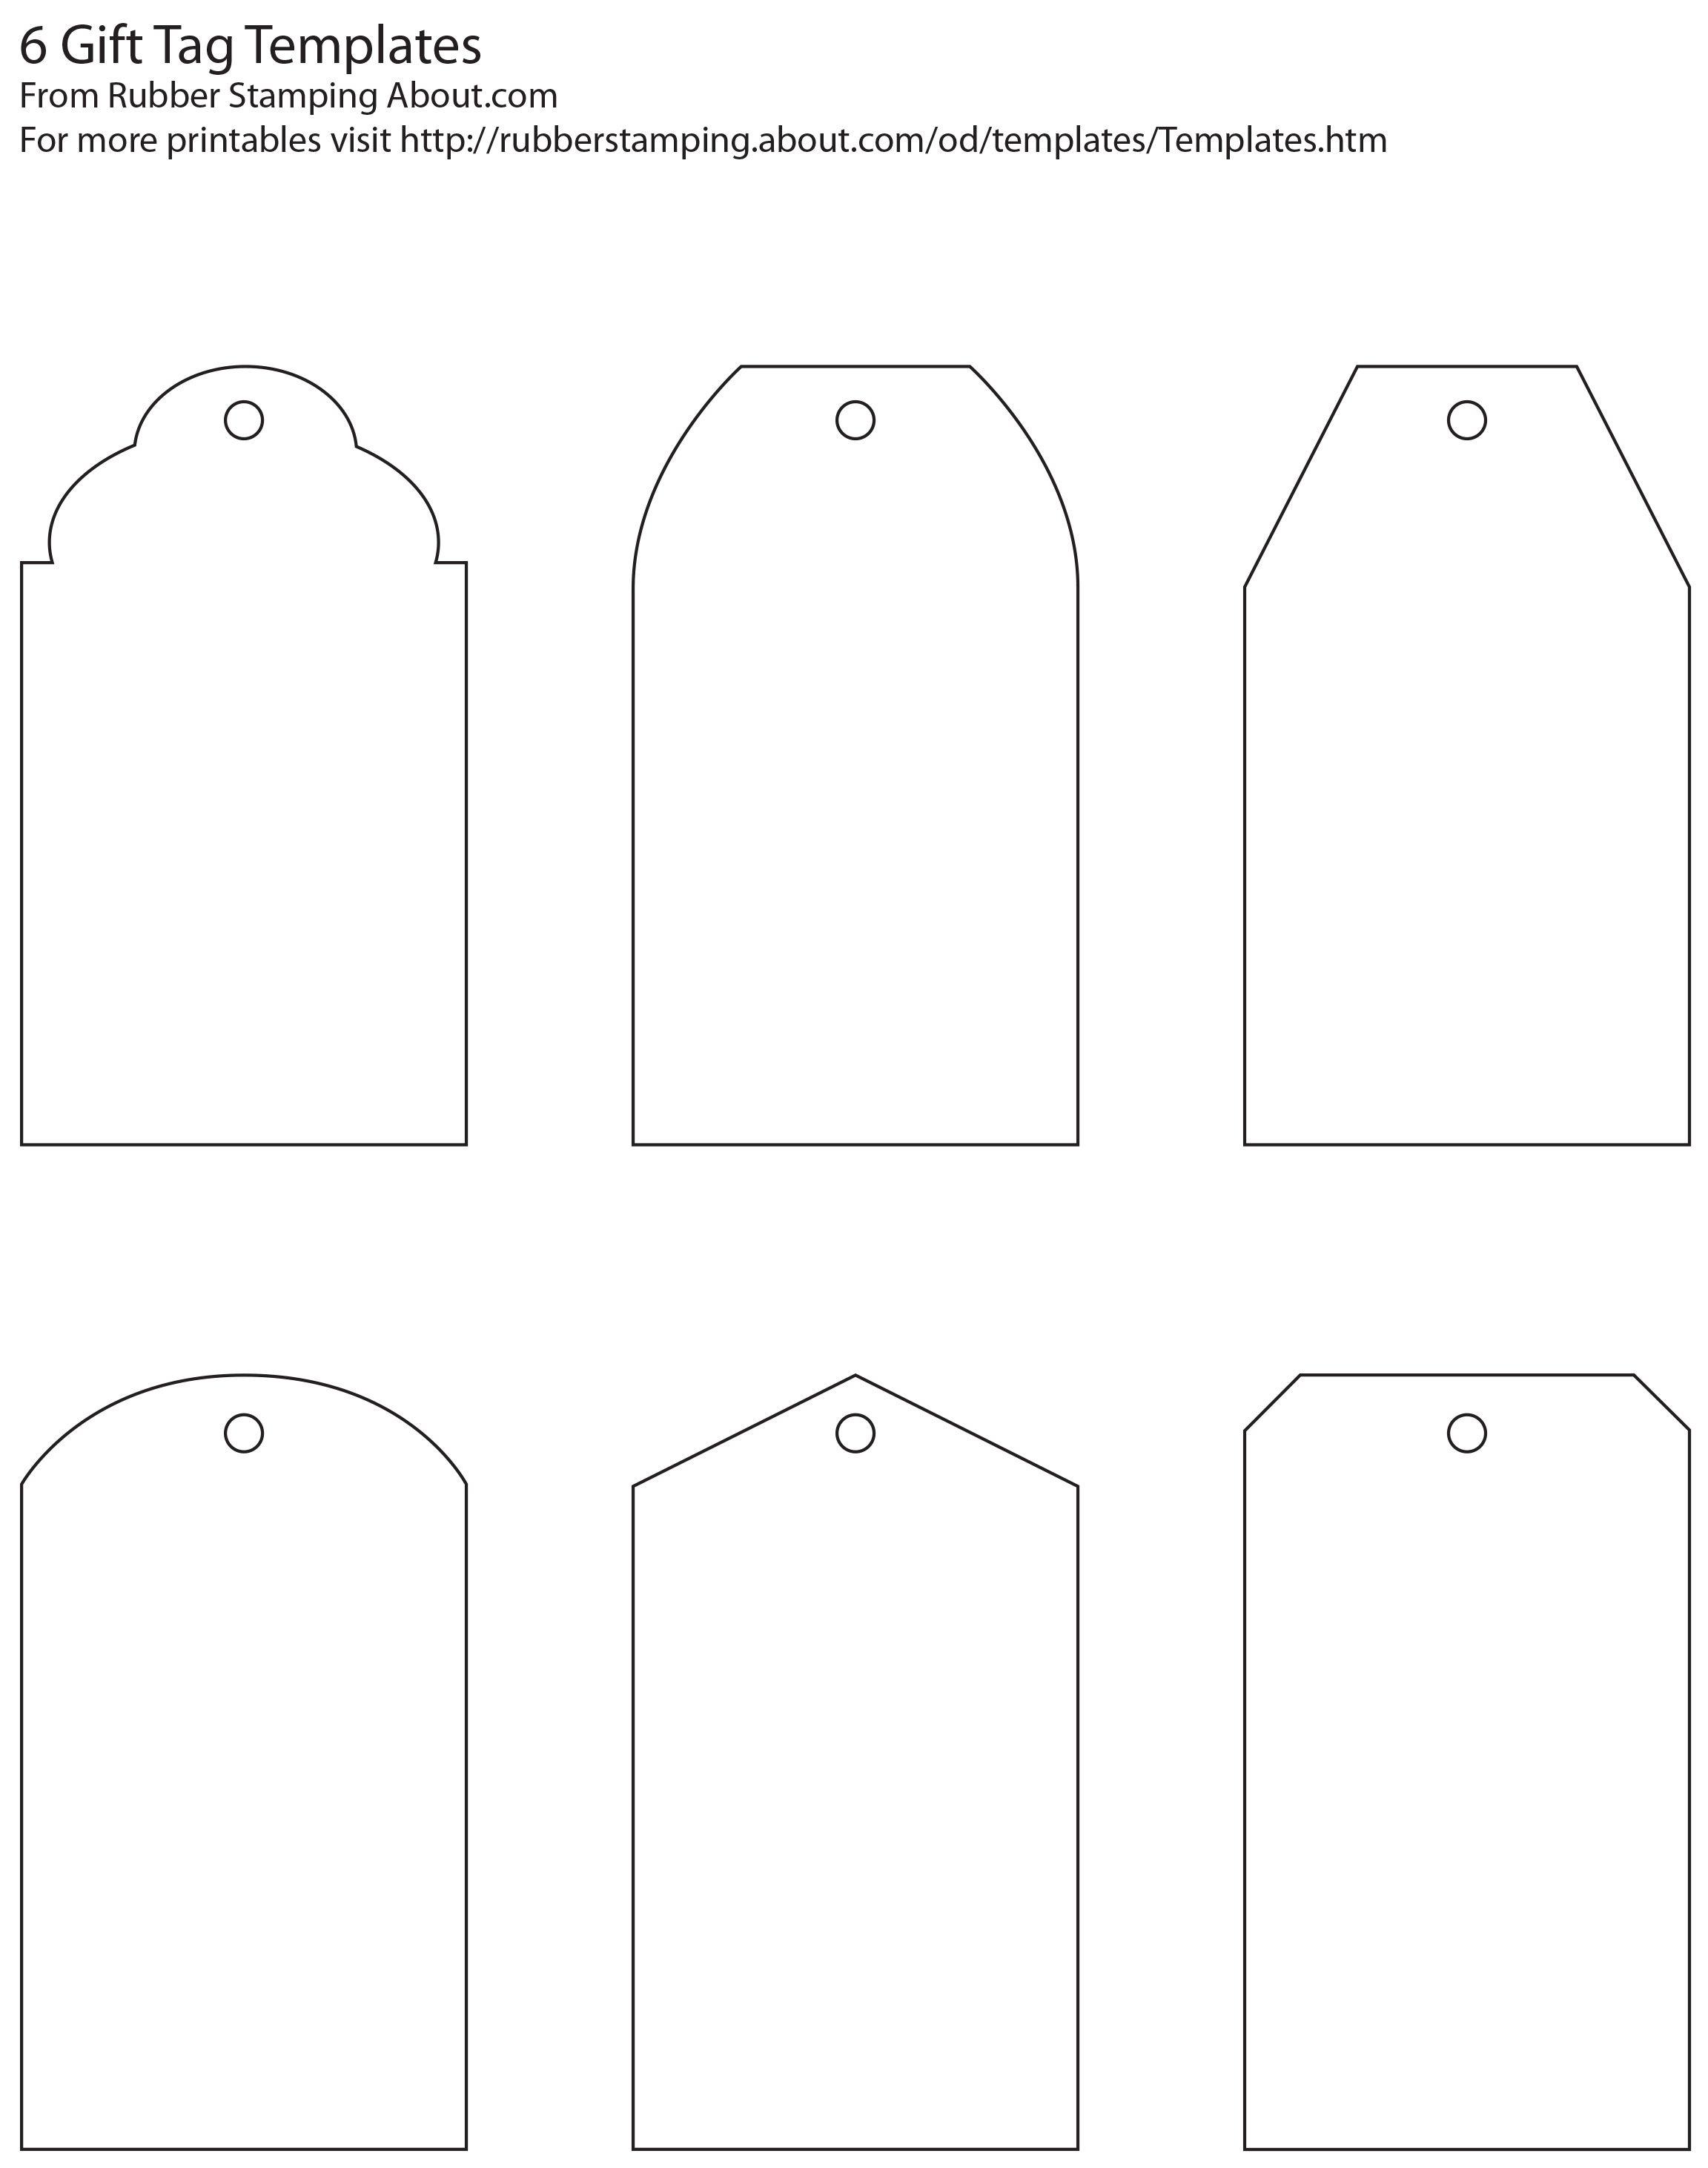 Free And Whimsical Printable Gift Tag Templates | Great Idea - Free Printable Gift Bag Tags